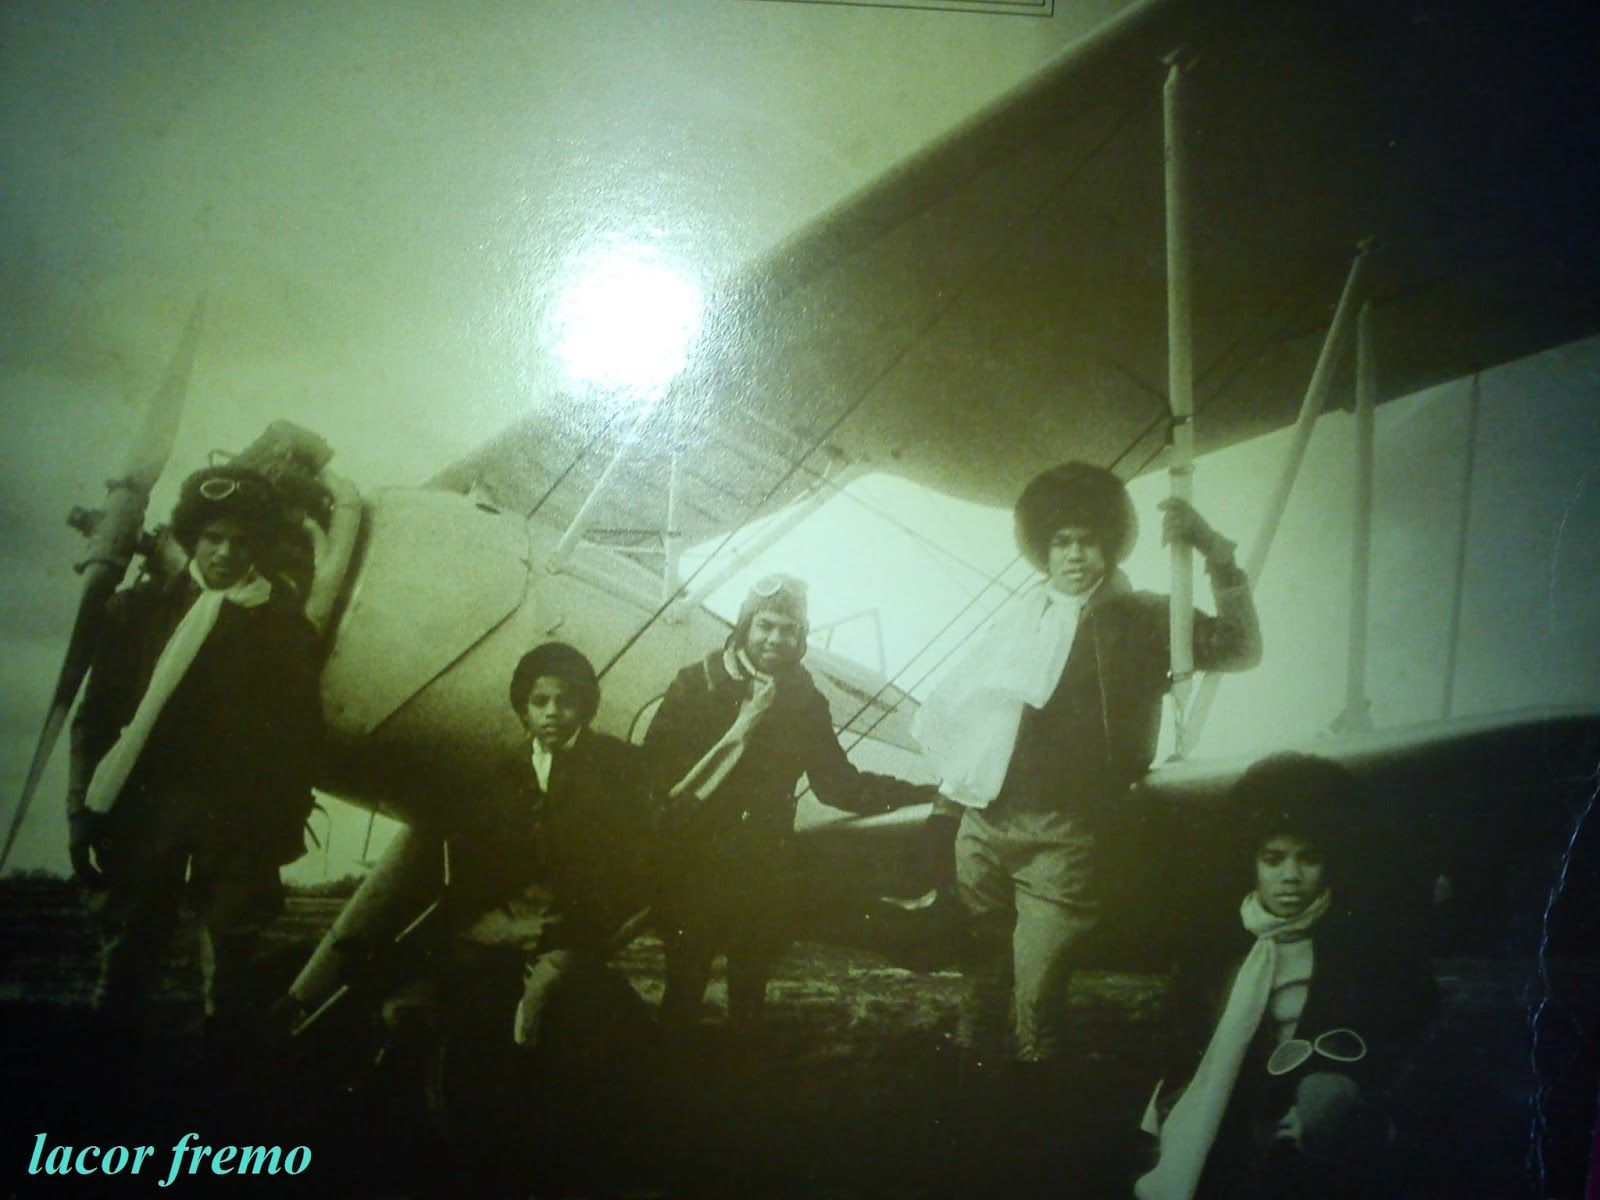 Kolekcjonowanie Lp Skywritter Jackson 5 Jackson 5 Jackson About Me Blog